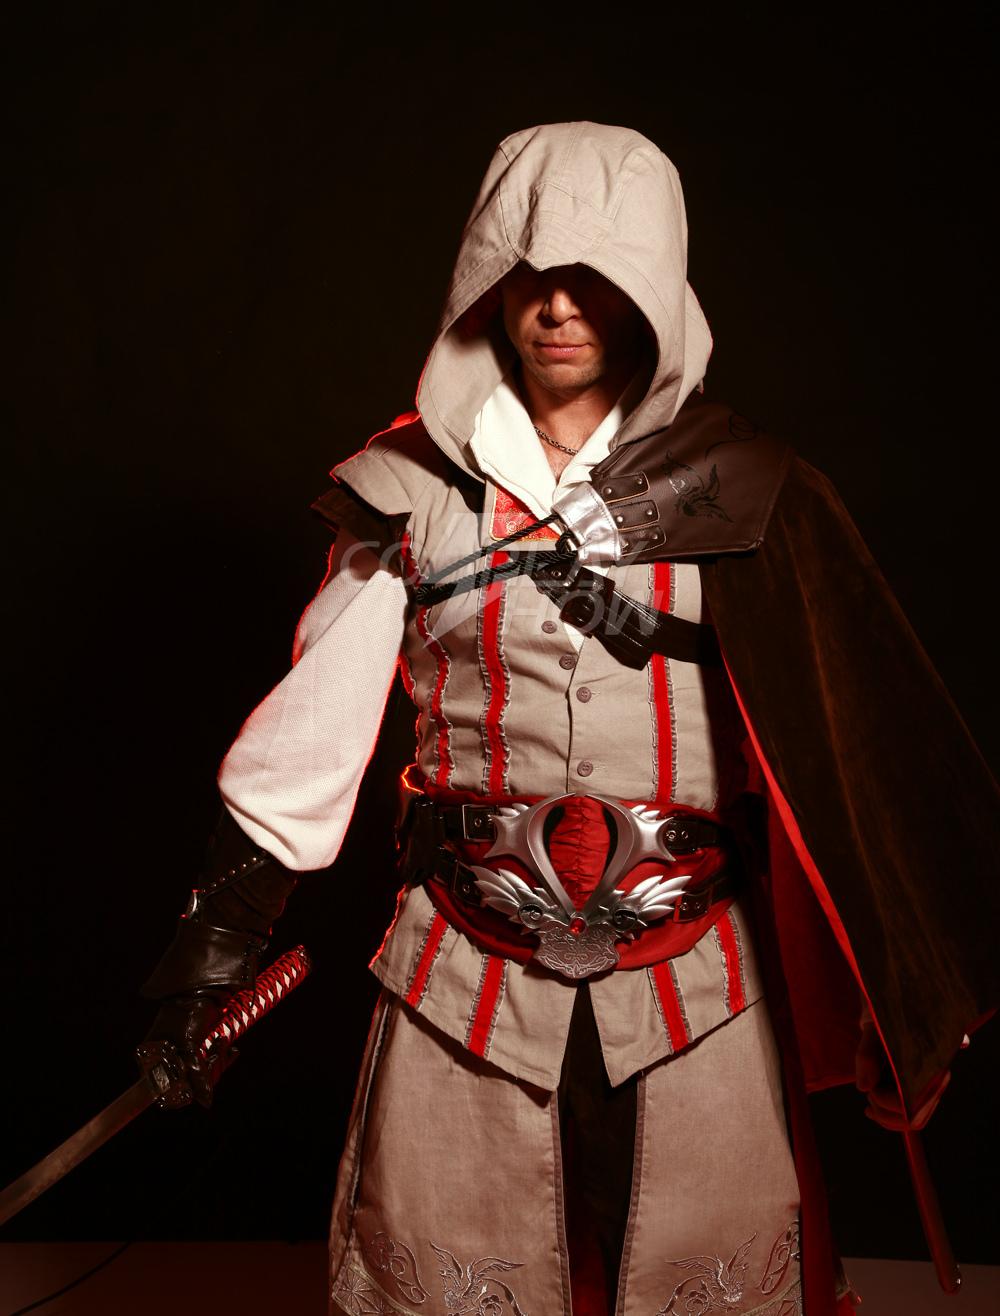 Inspiré par l Assassin Creed Ezio Halloween Cosplay Costume -  cosplayshow.com 09de6b10990